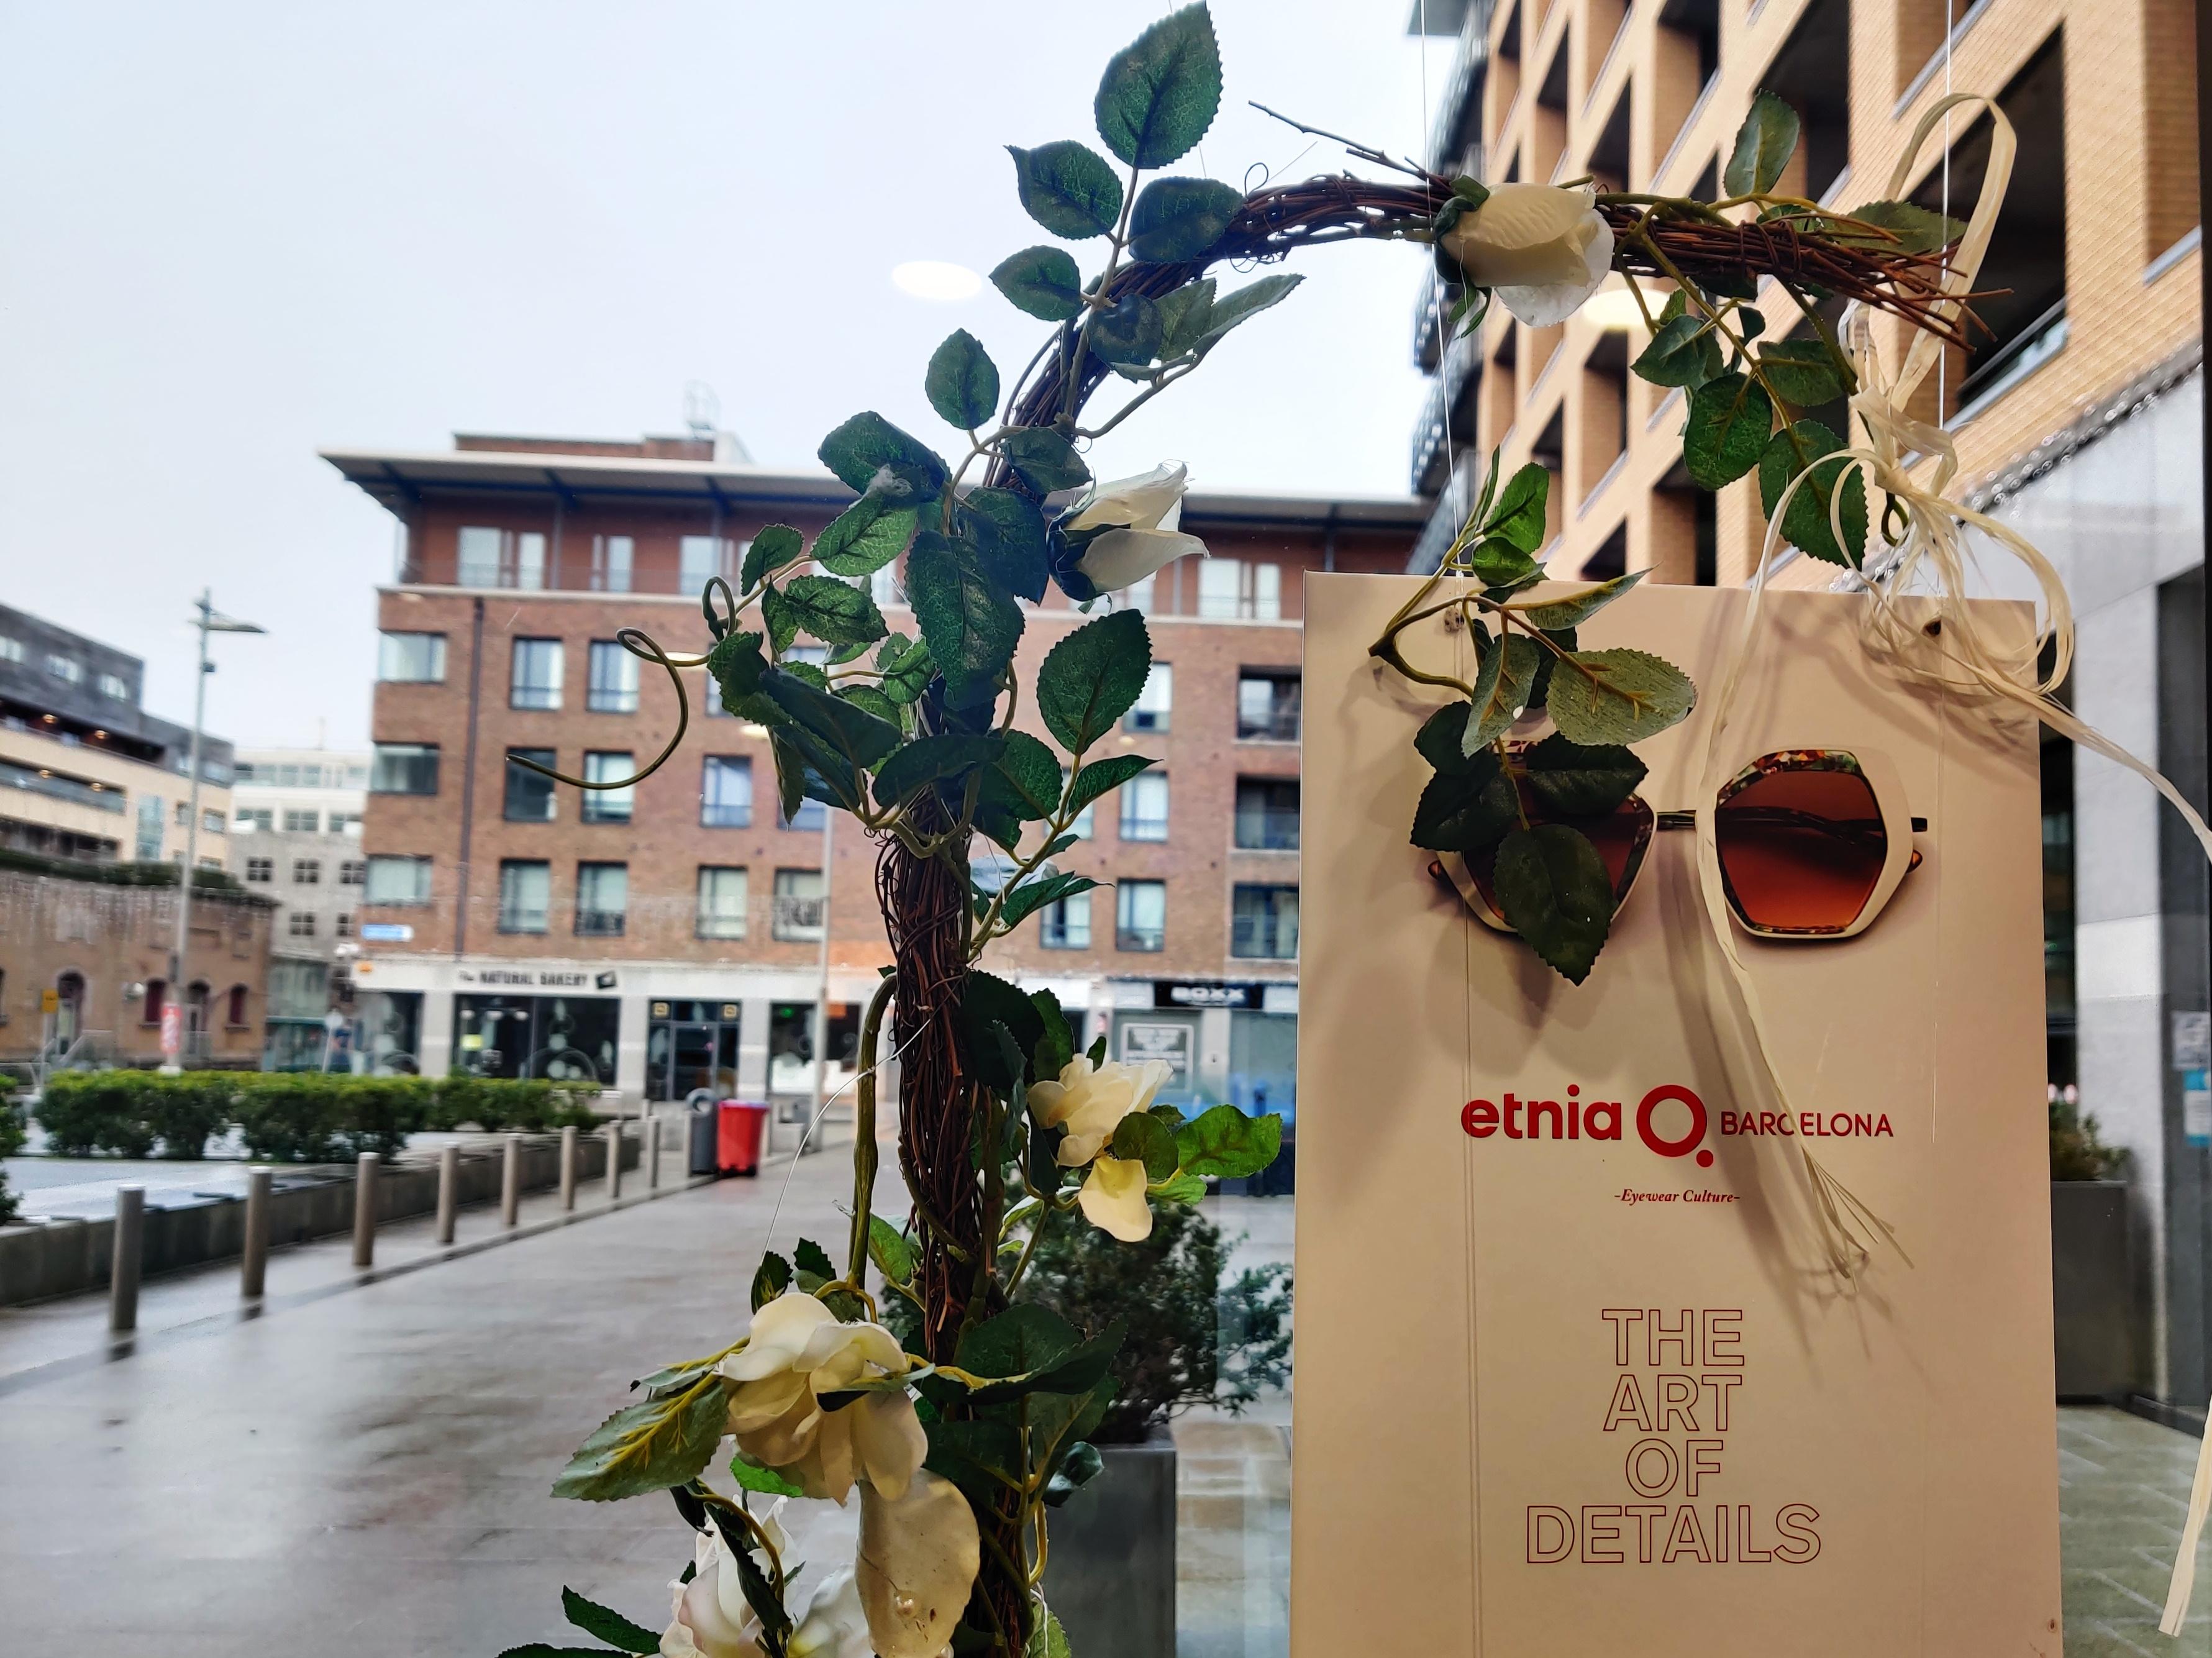 Gilna Opticians etnia Barcelona